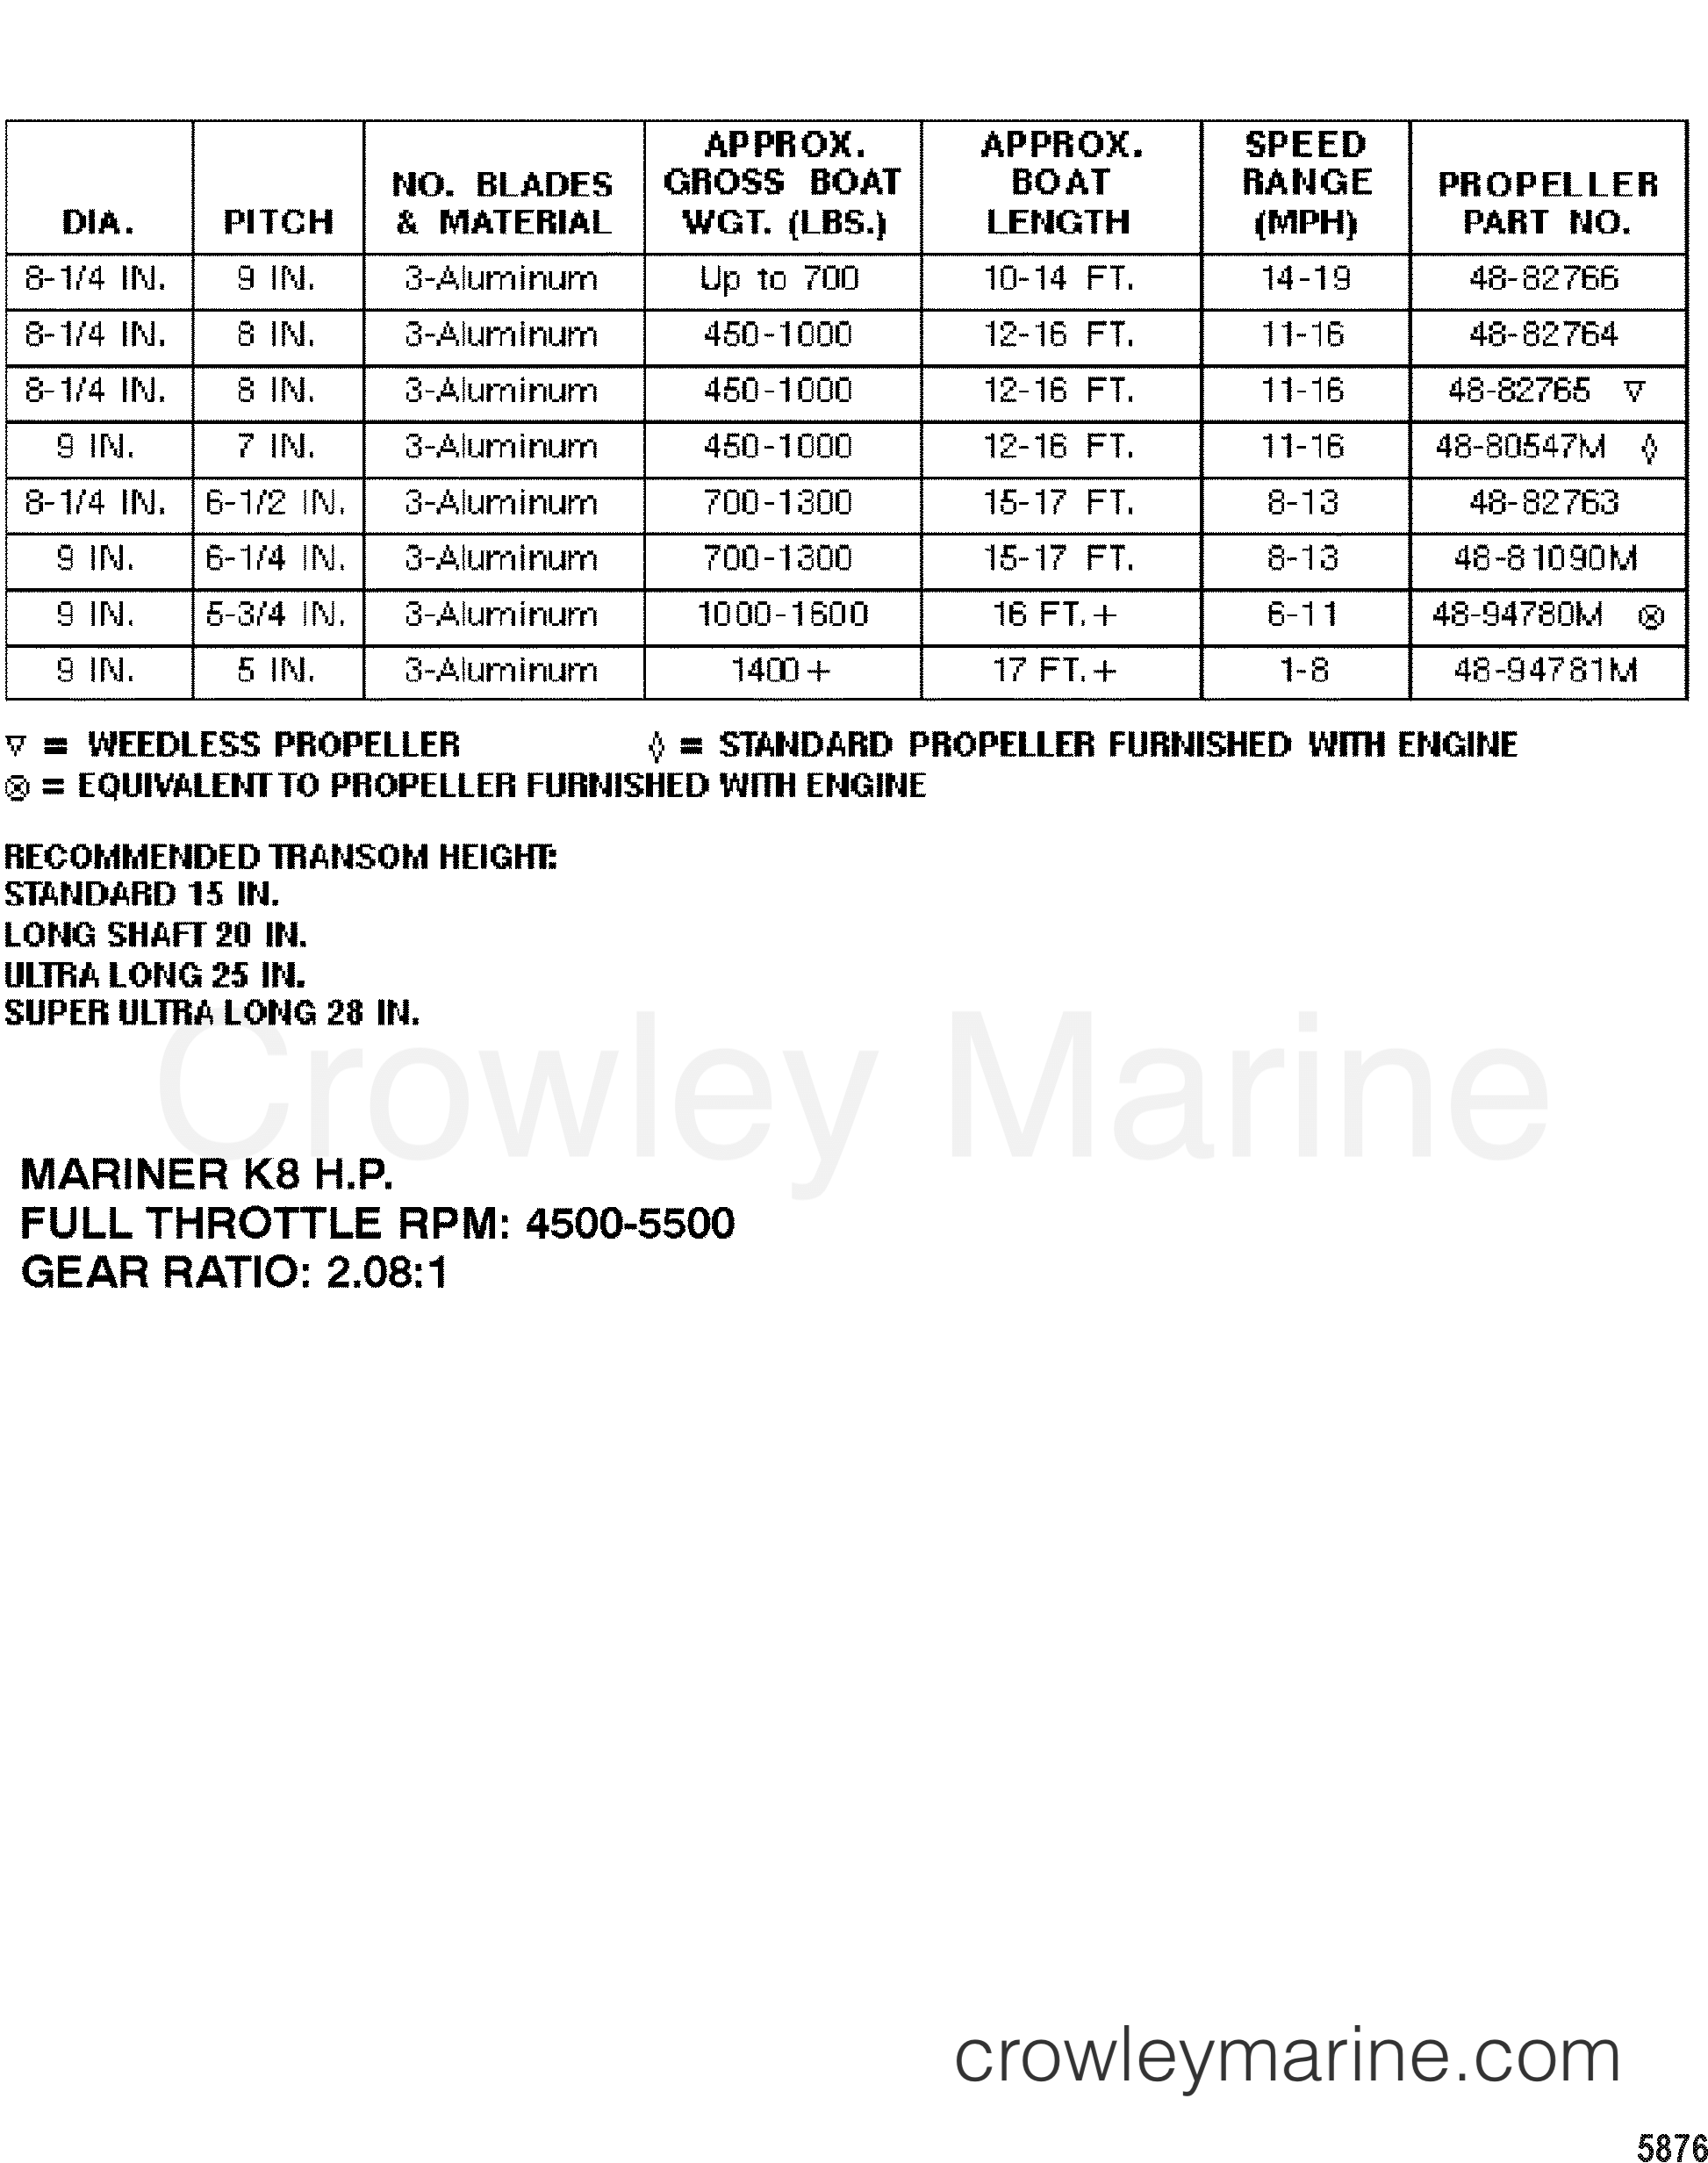 mariner serial number chart